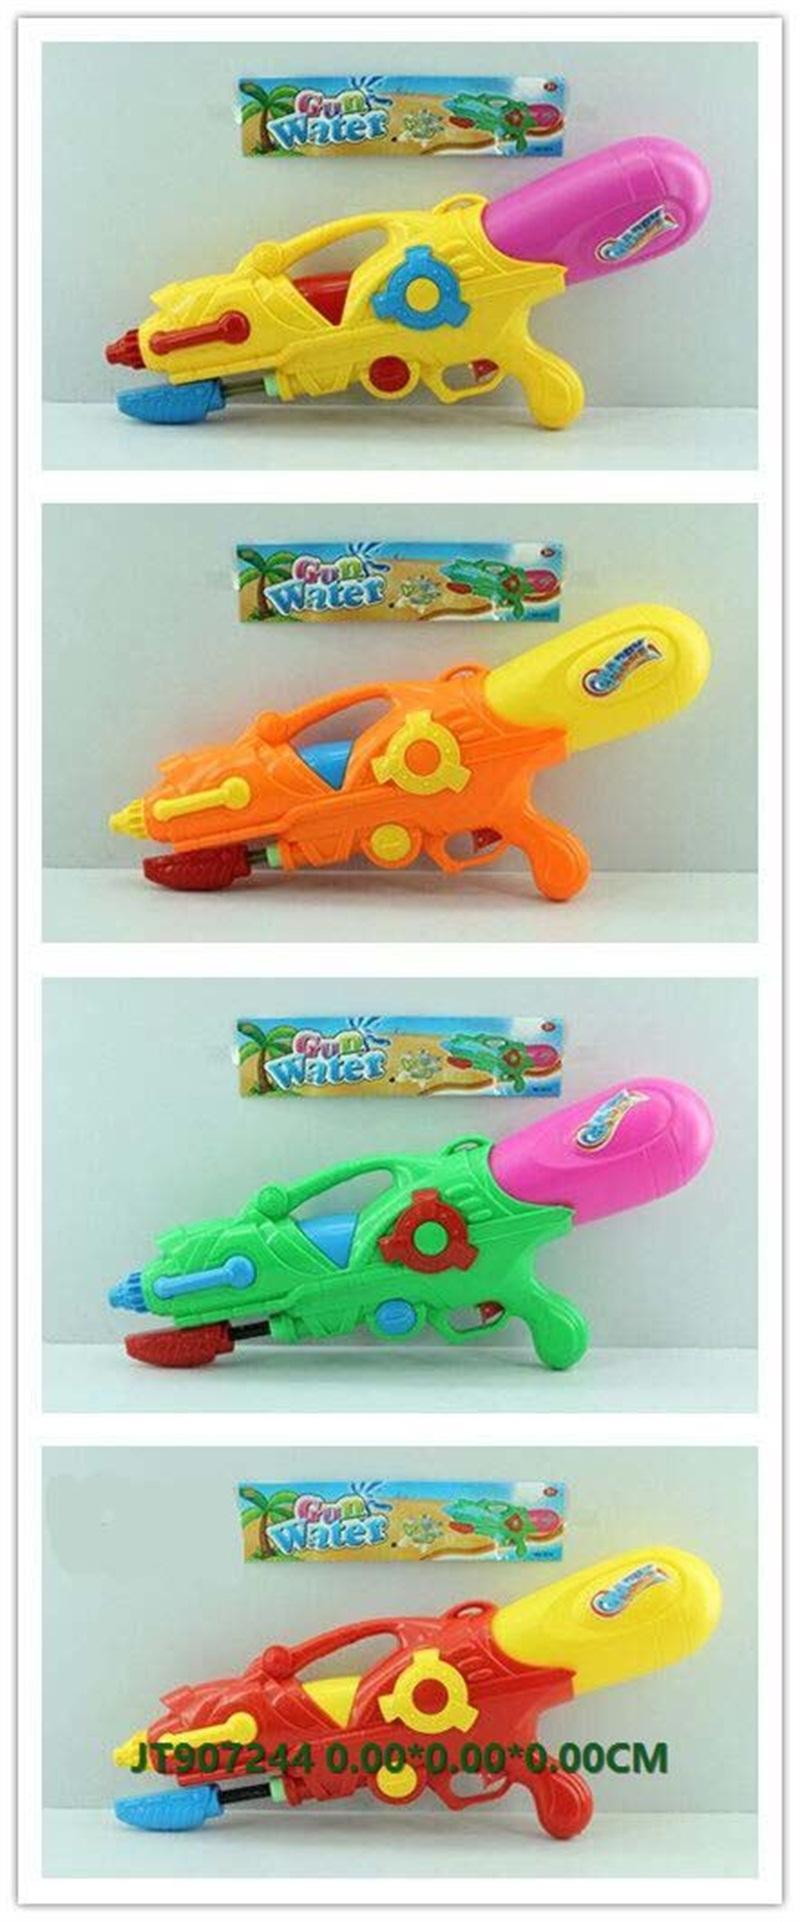 Water Gun toys  No.JT907244